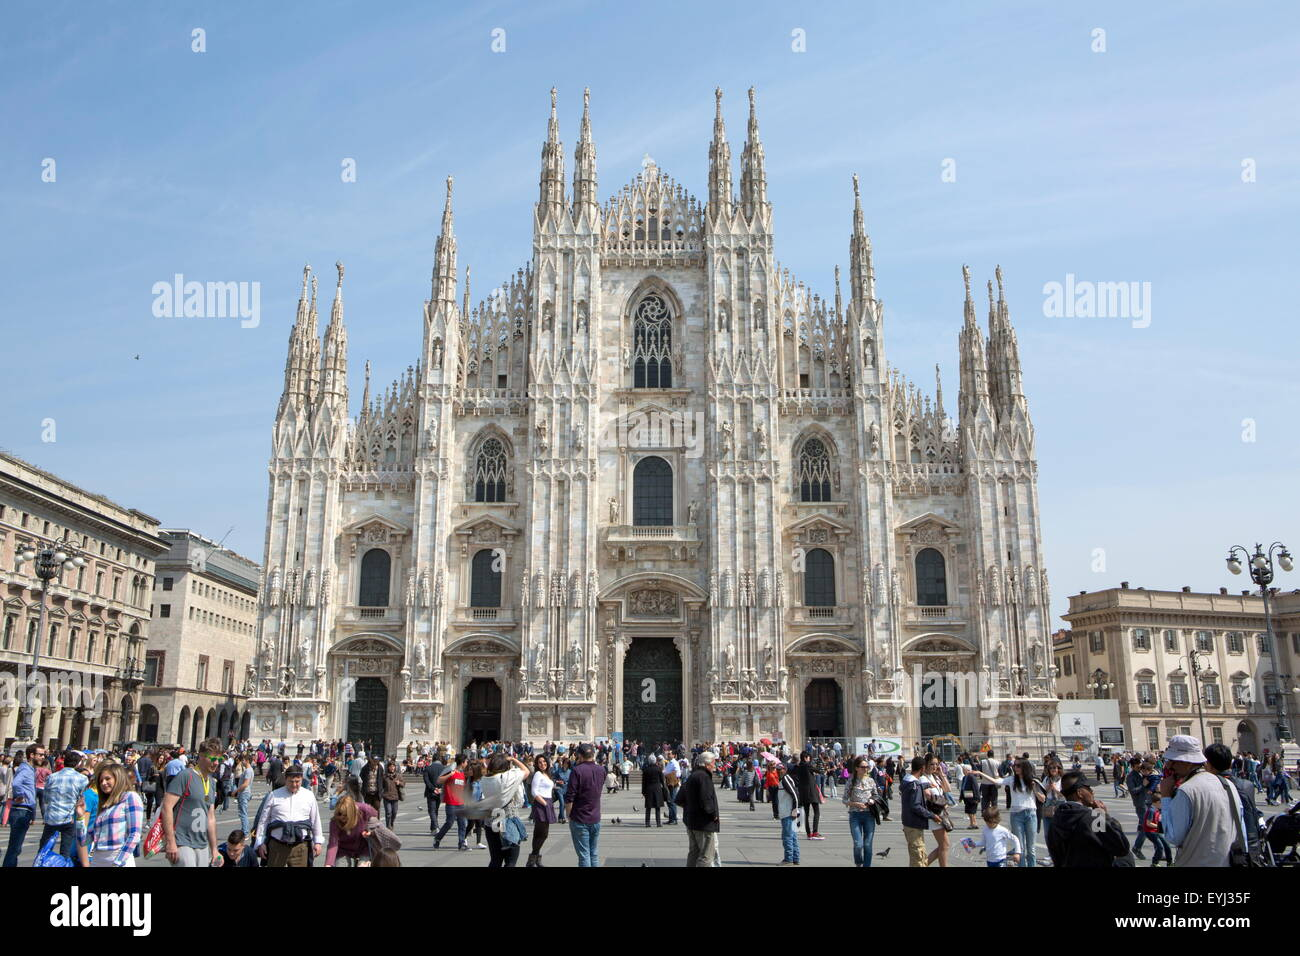 Piazza del Duomo (Milan), Milano, Lombardy region, Italy - Stock Image